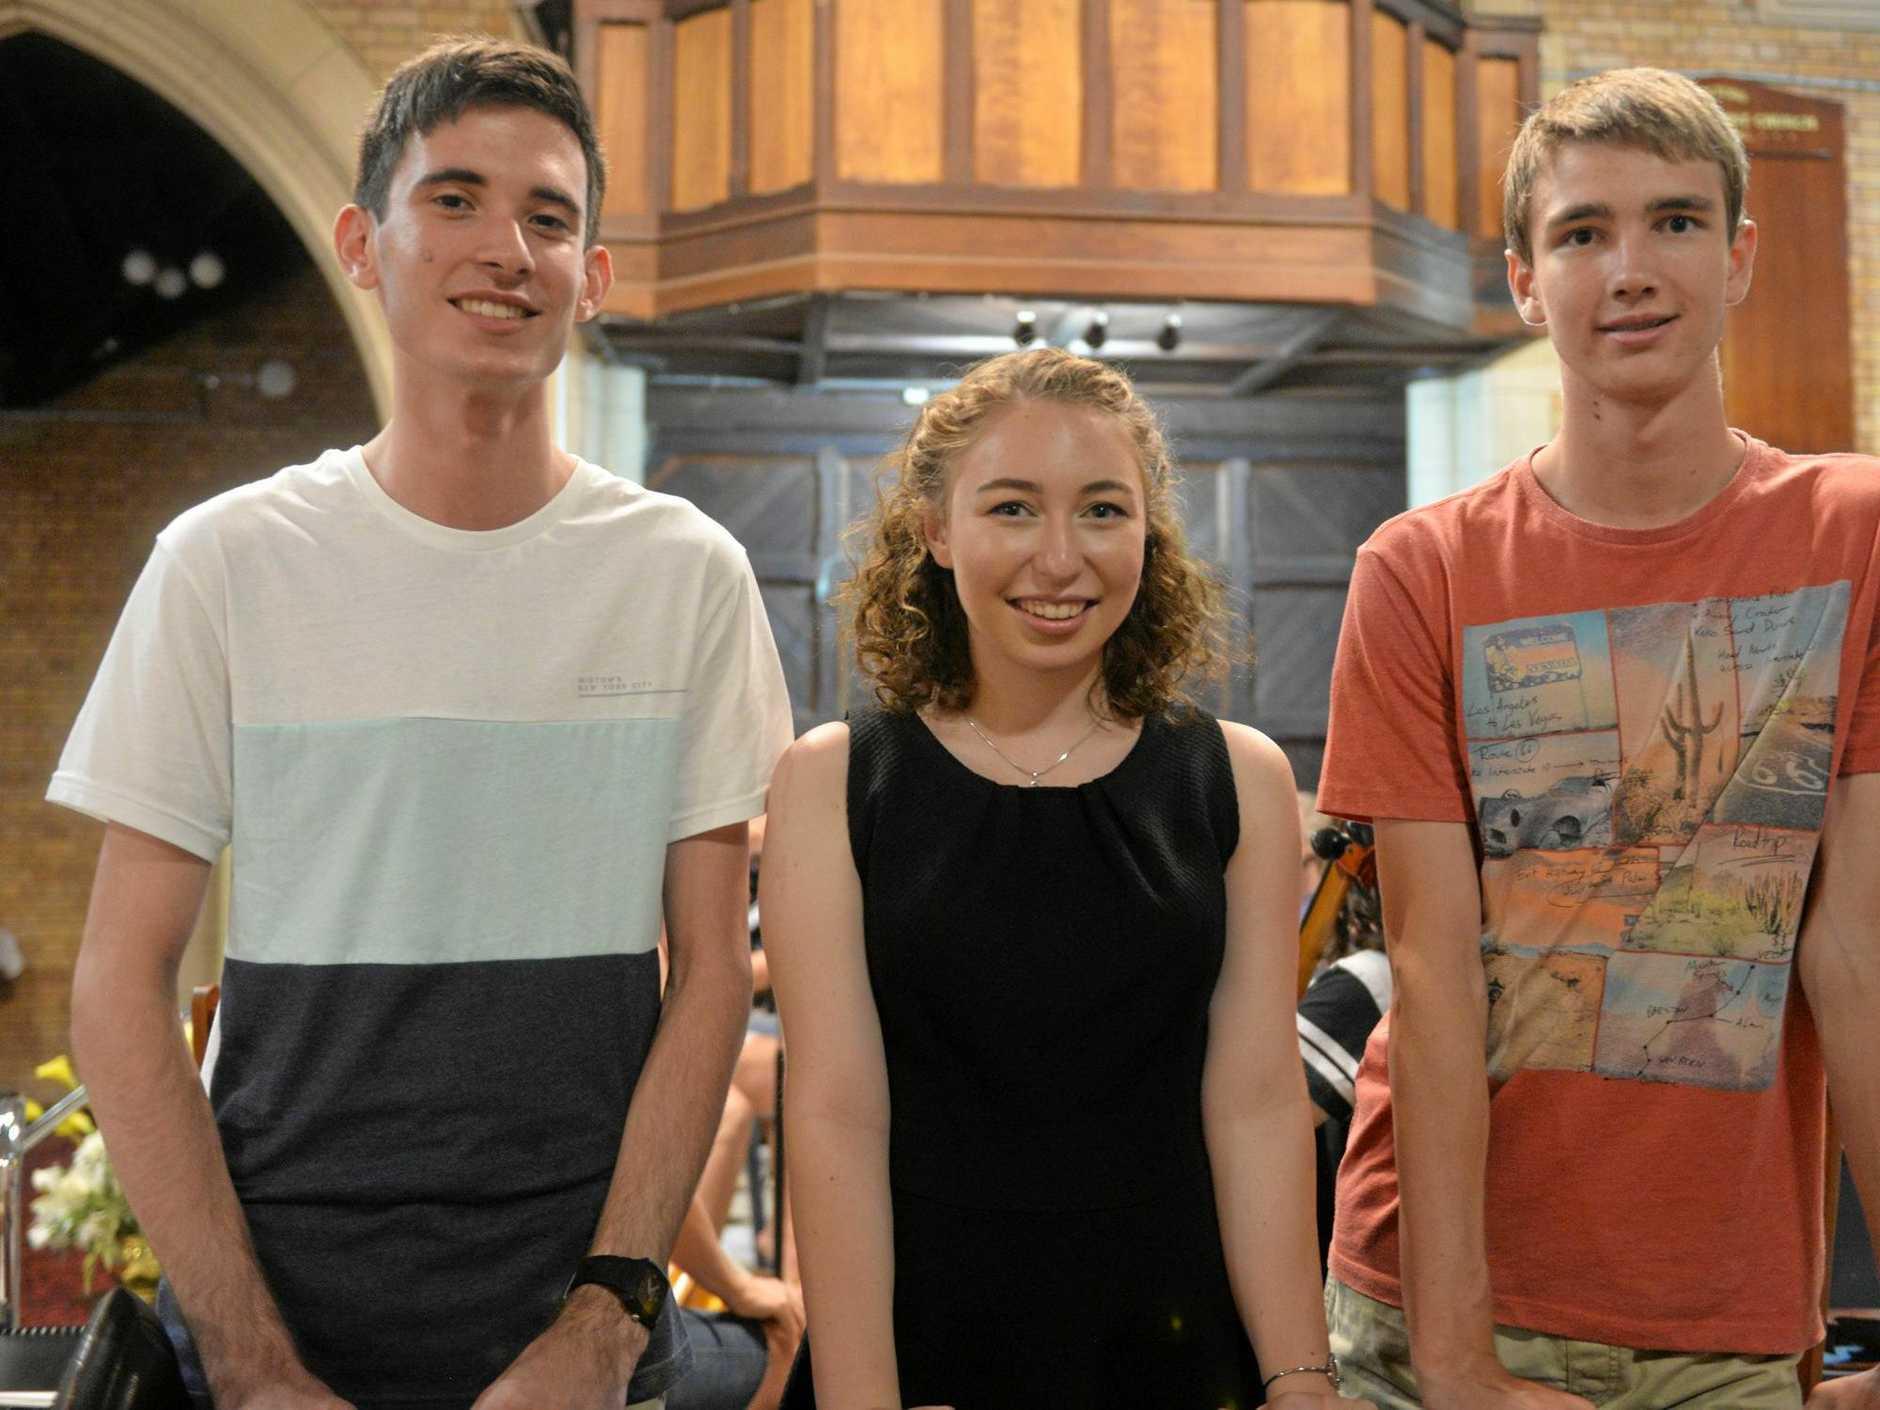 Bundaberg artists team up for create film score | News Mail